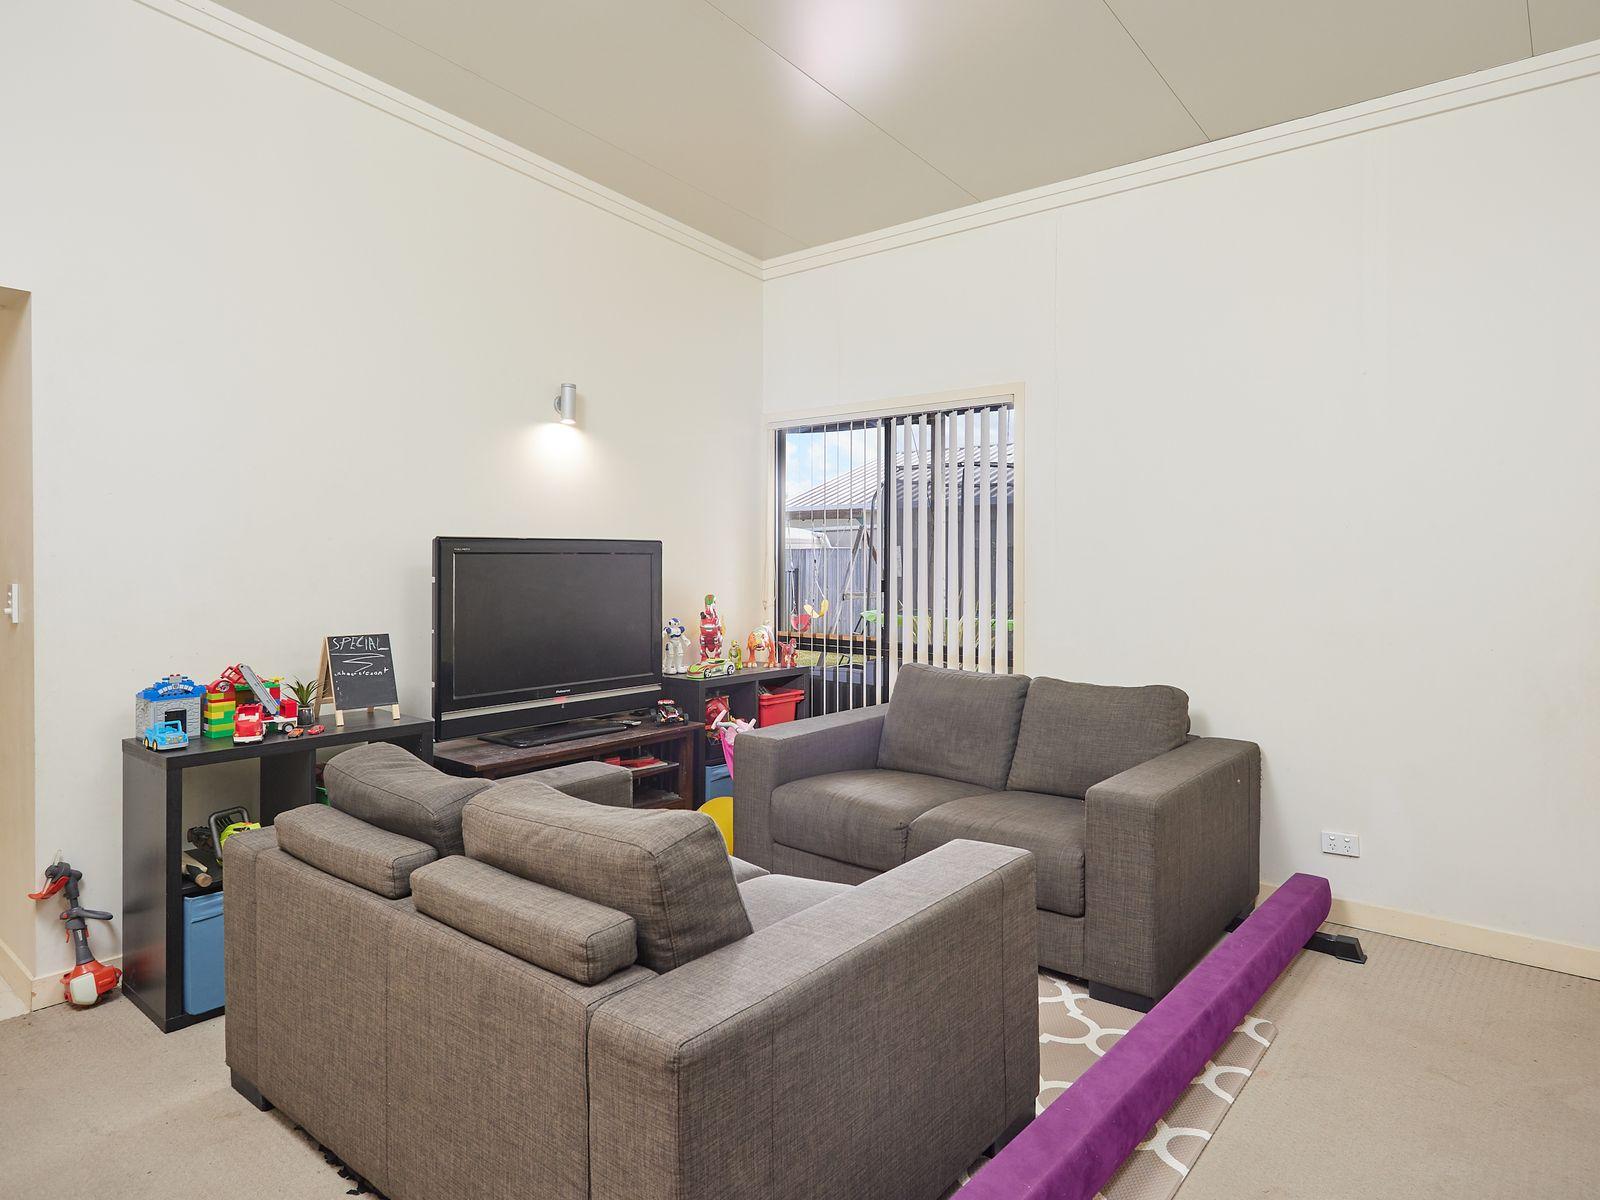 8 Deepak Drive, Pimpama, QLD 4209